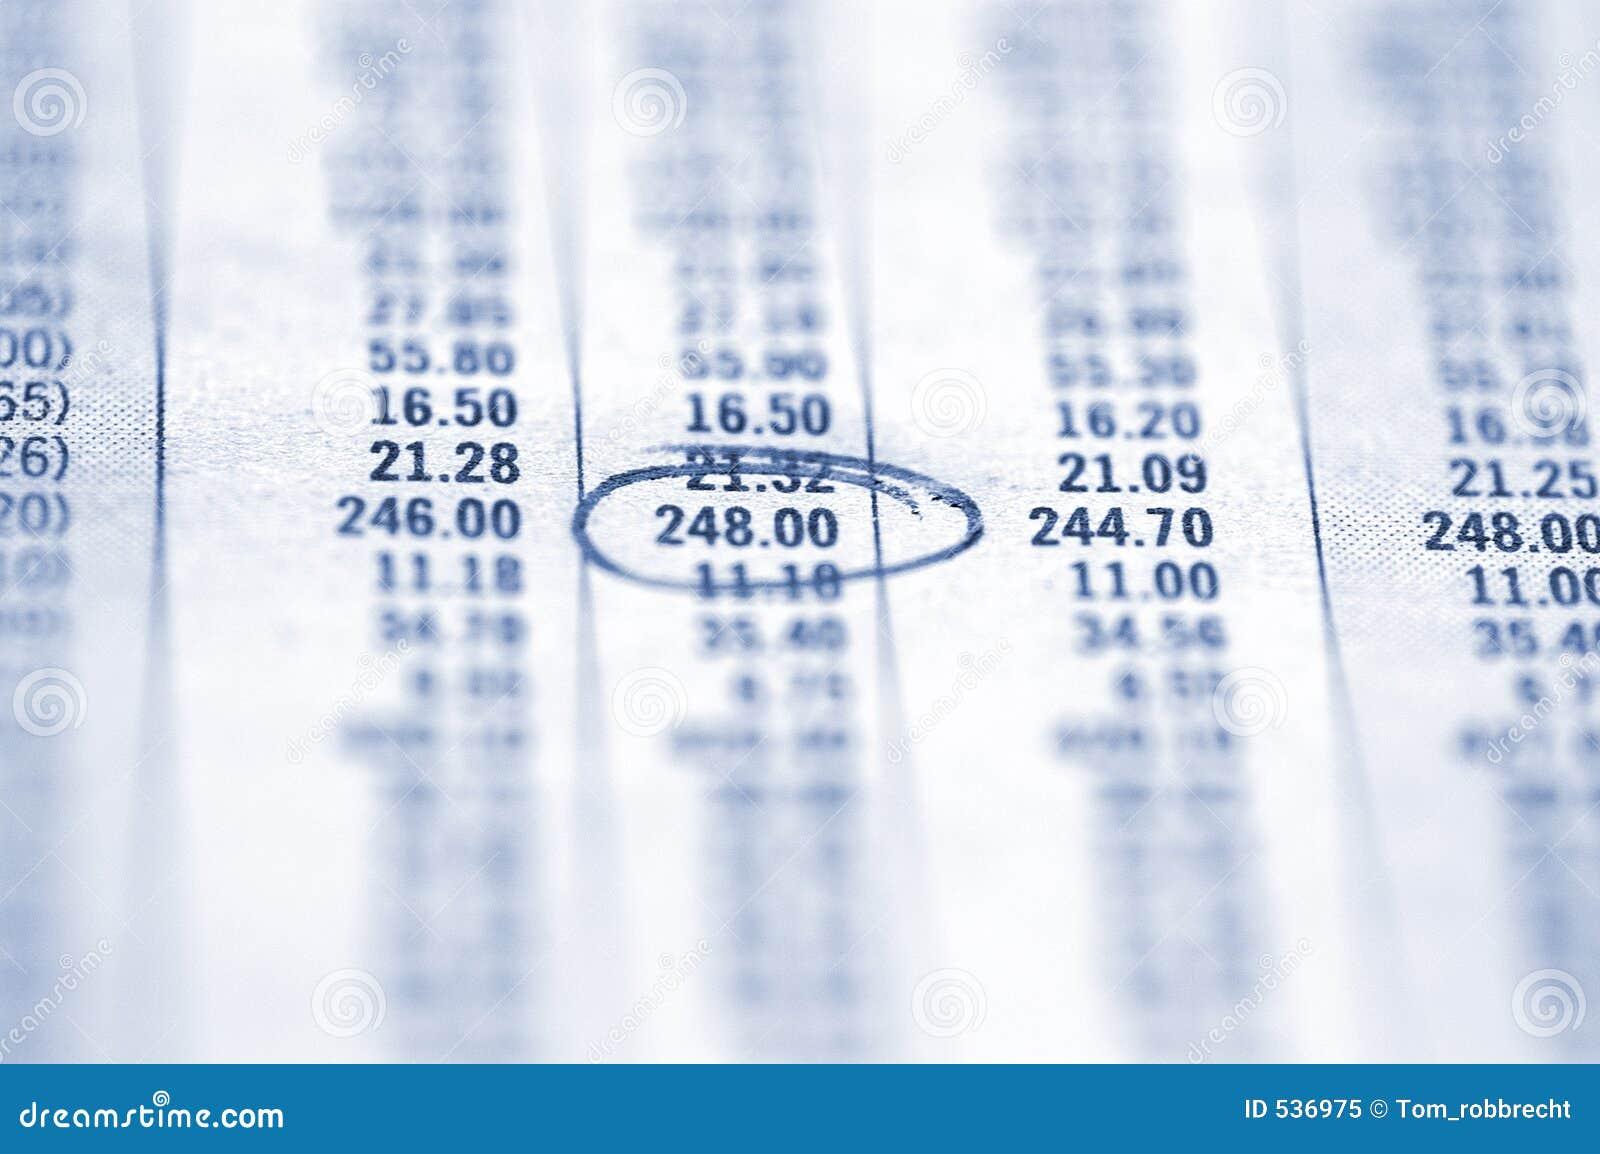 Download 盘旋的图 库存图片. 图片 包括有 复核, 圈子, 财务, 收入, 市场, 商业, 统计数据, 玻璃, 数据 - 536975